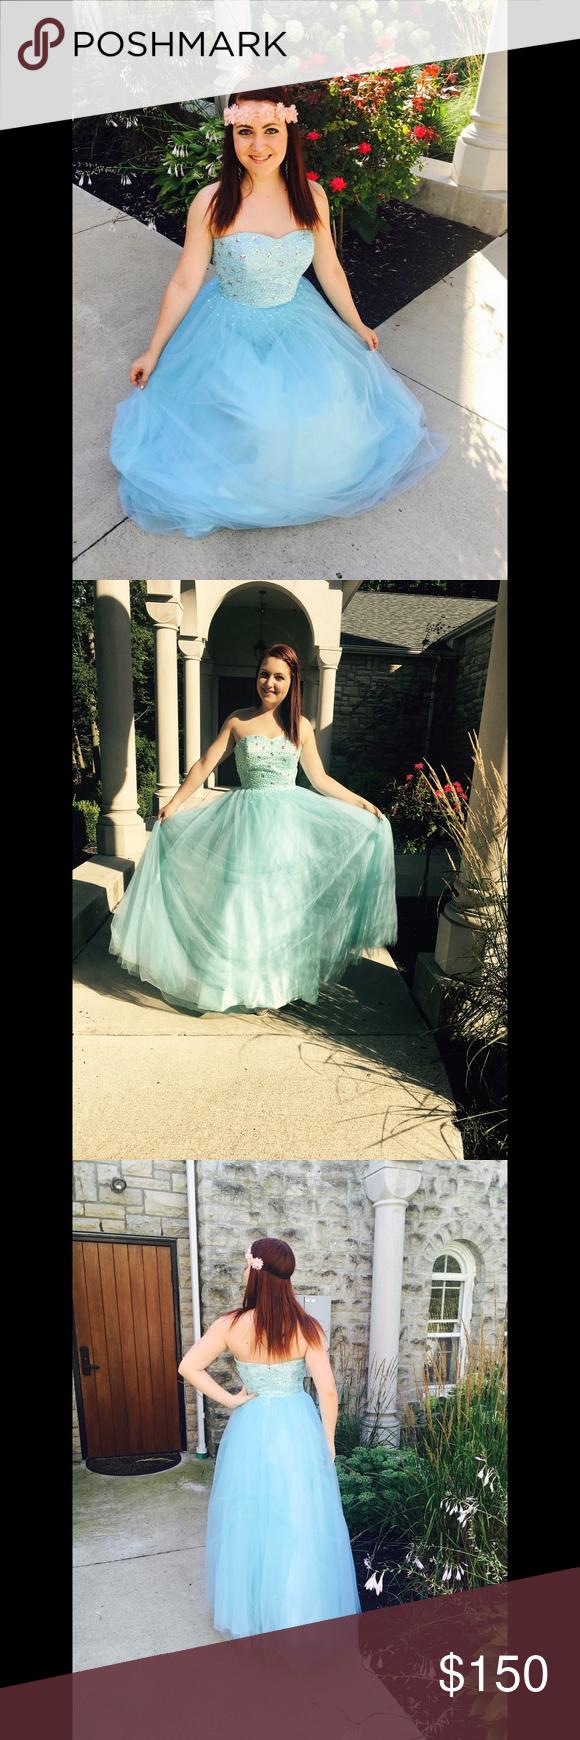 Light blue sweetheart neckline prom dress wedding dress brands